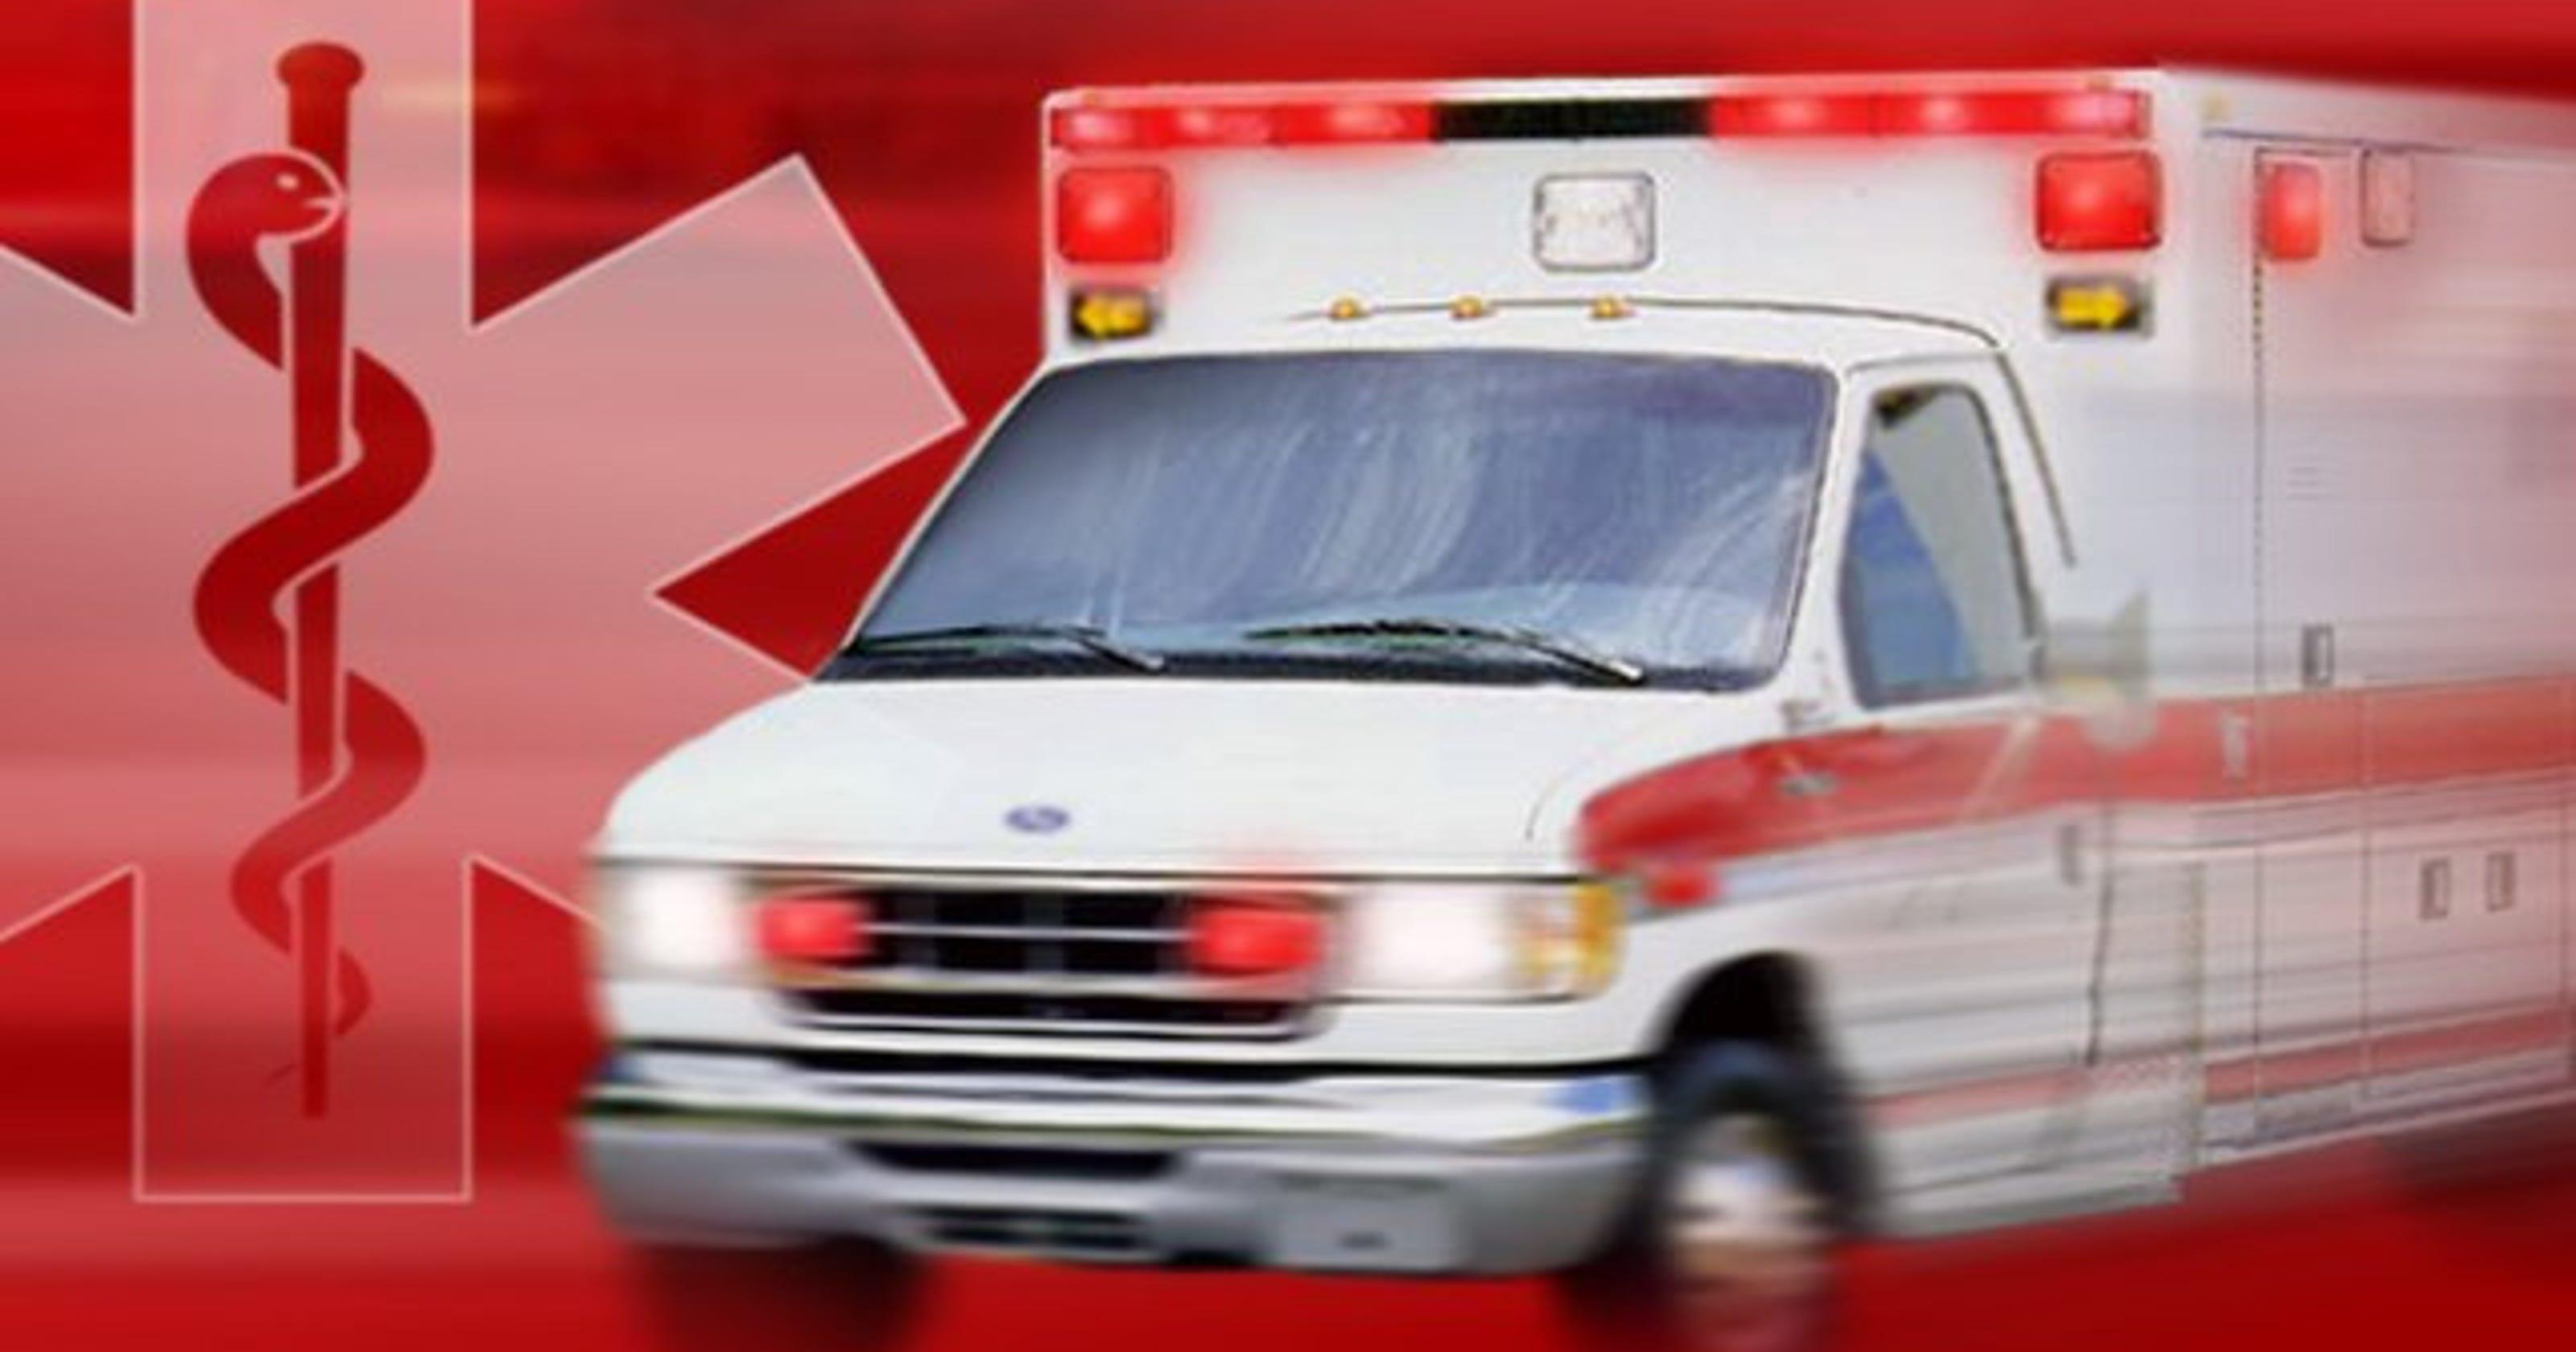 2 paramedics injured in ambulance rollover crash